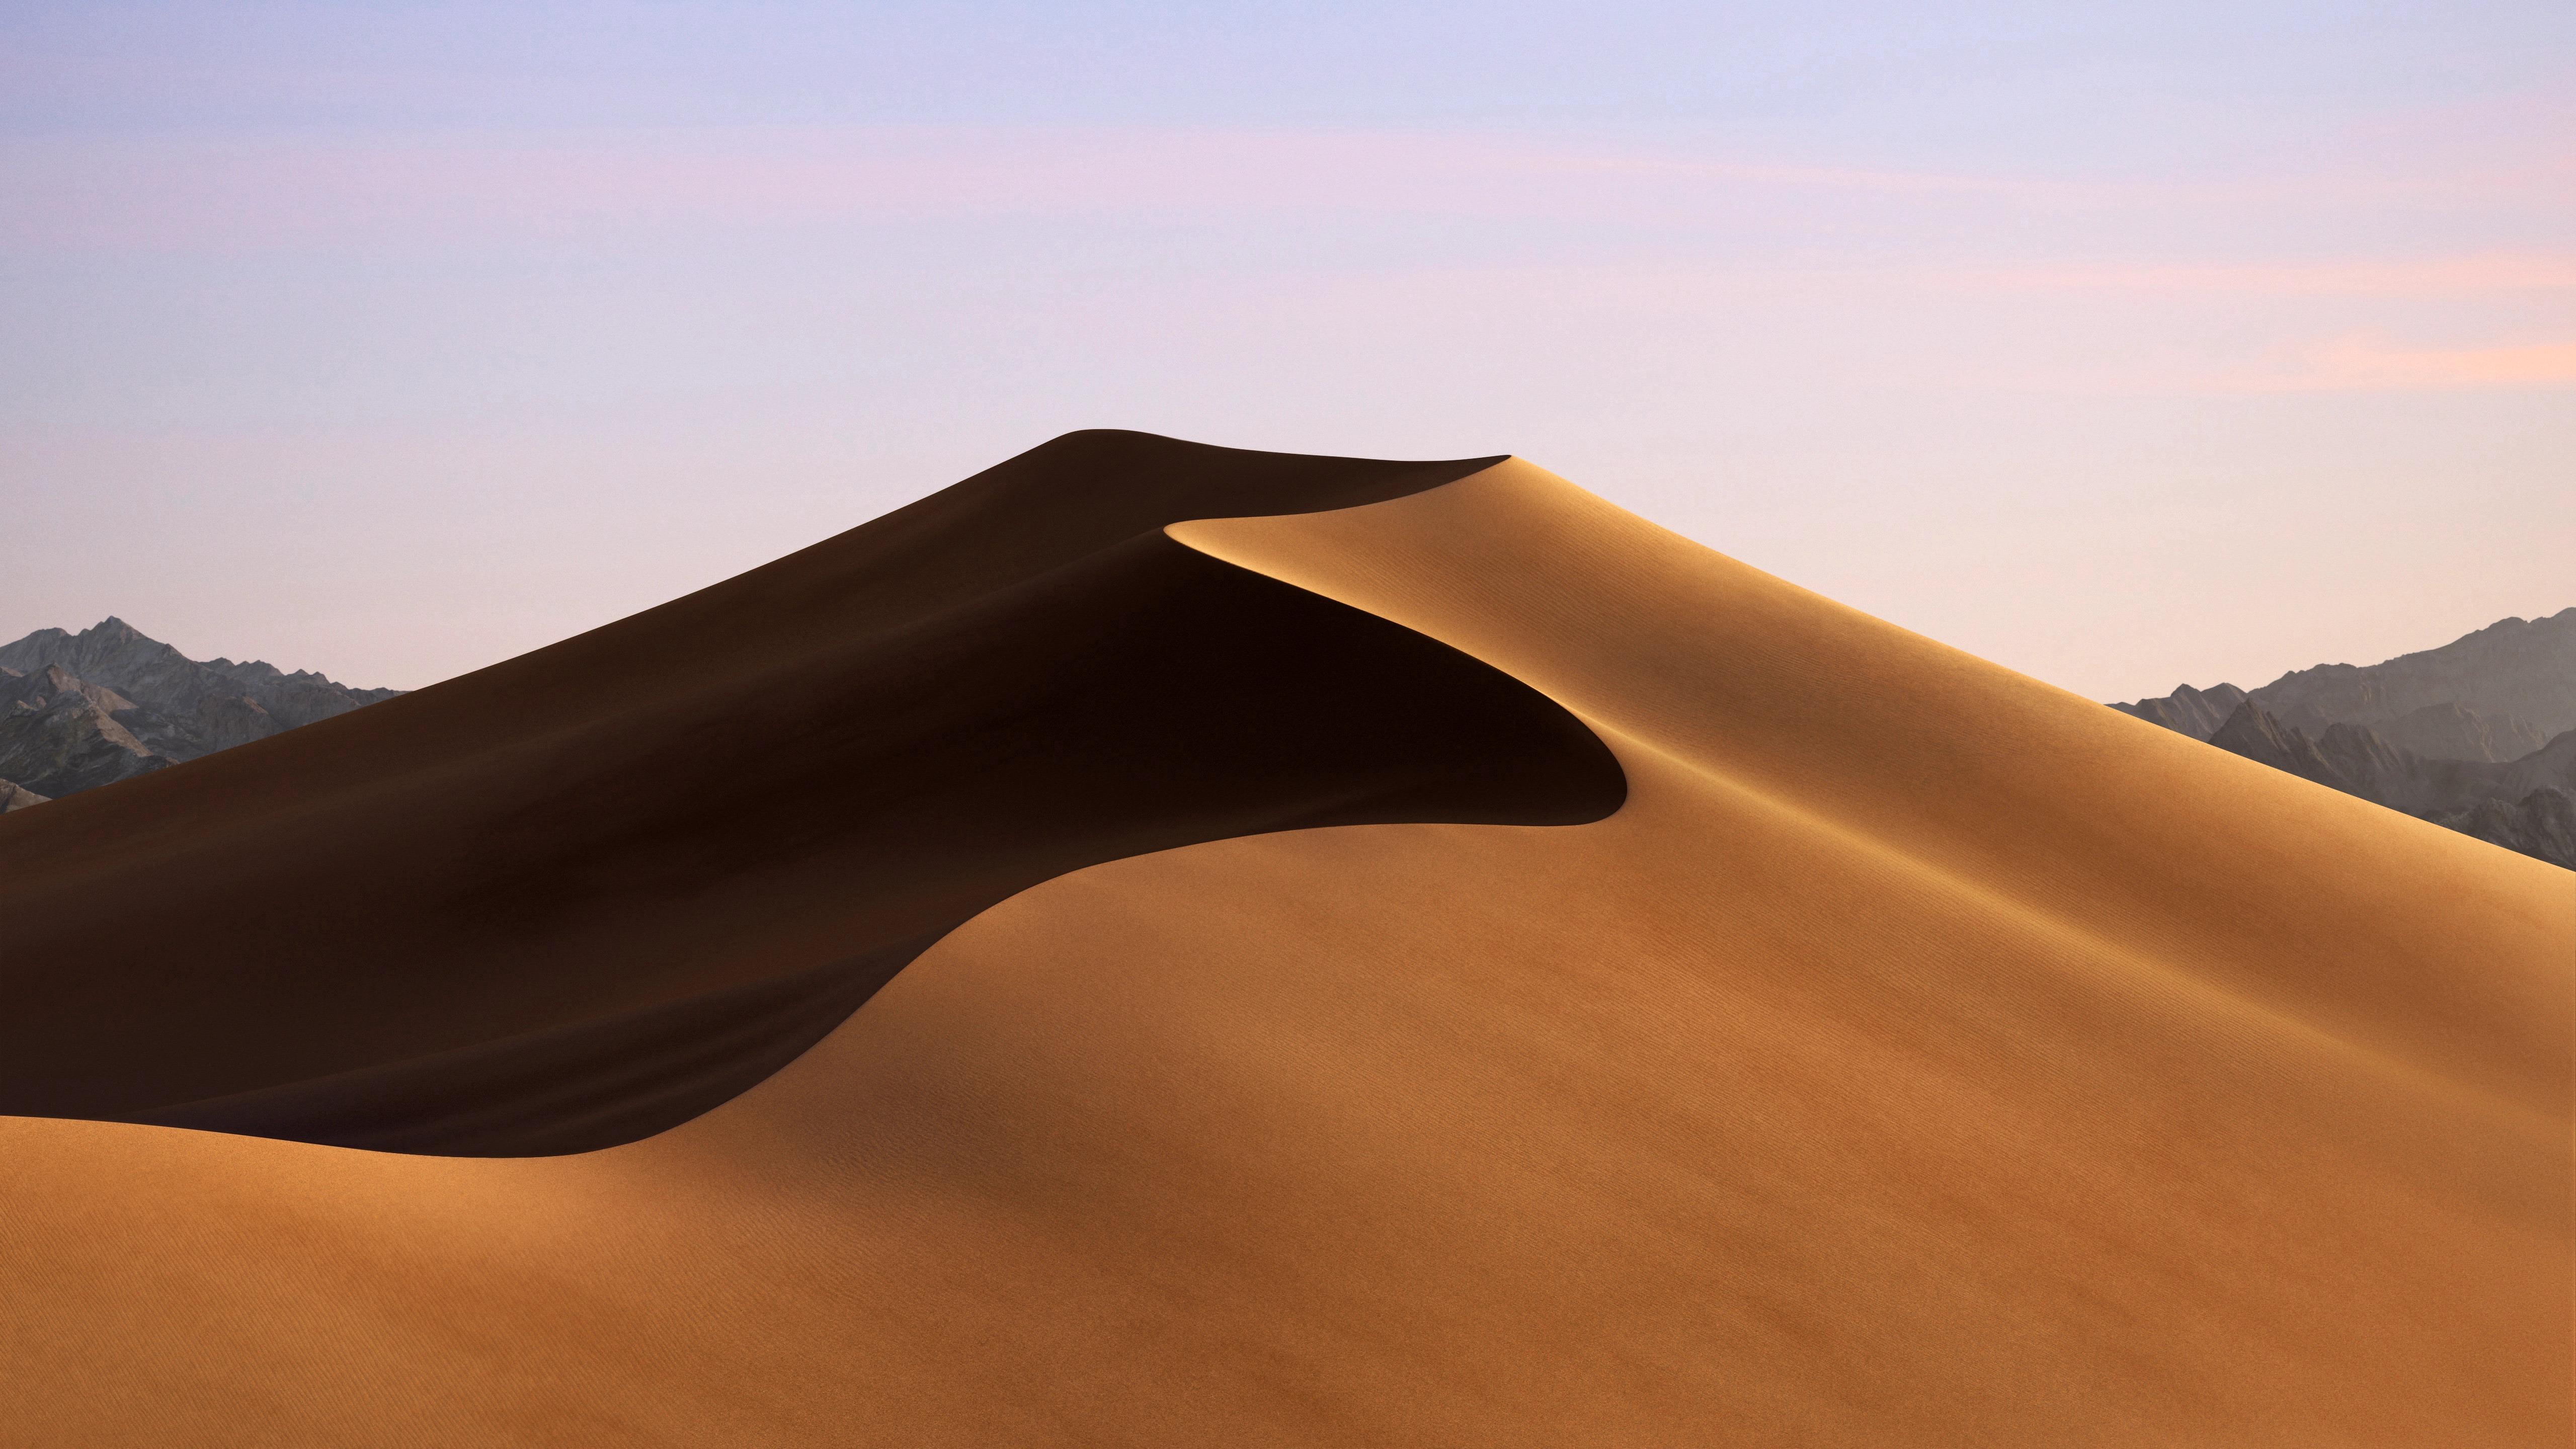 Mac Os Mojave 12 Dynamic Wallpapers 4K Ready by Yashlaptop ...